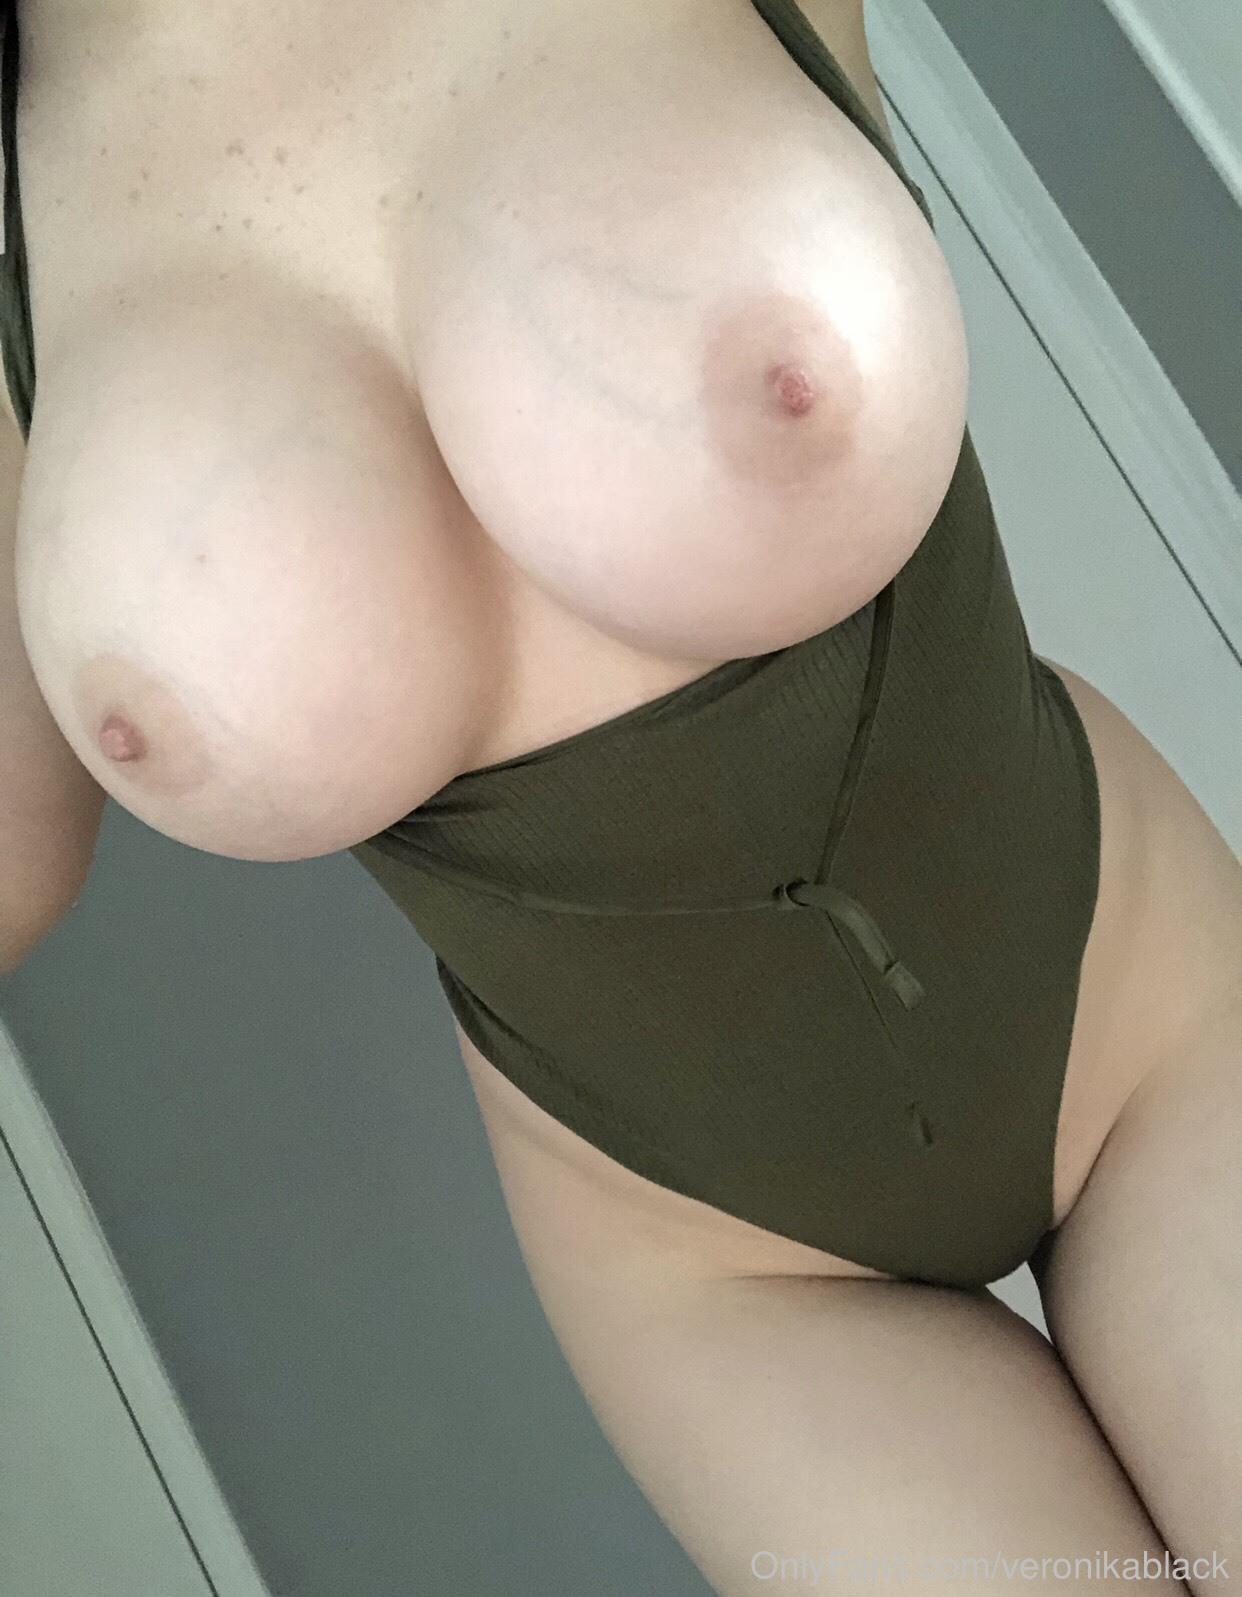 Veronica Black Nude Topless Boobs Ass